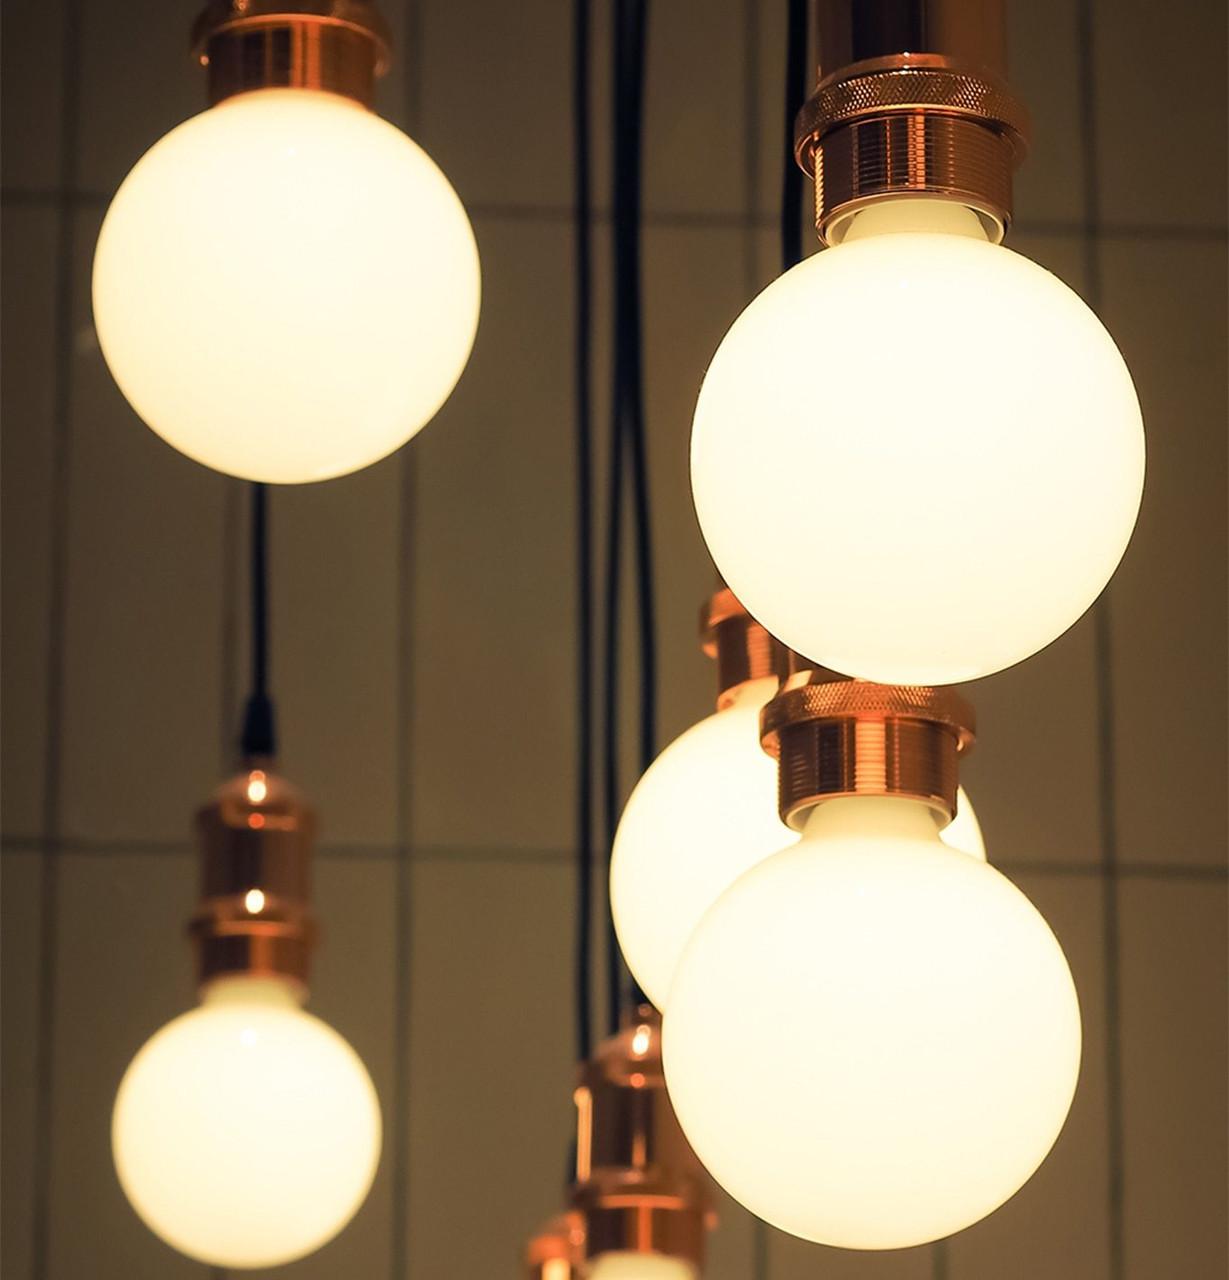 LED Dimmable G80 ES Light Bulbs